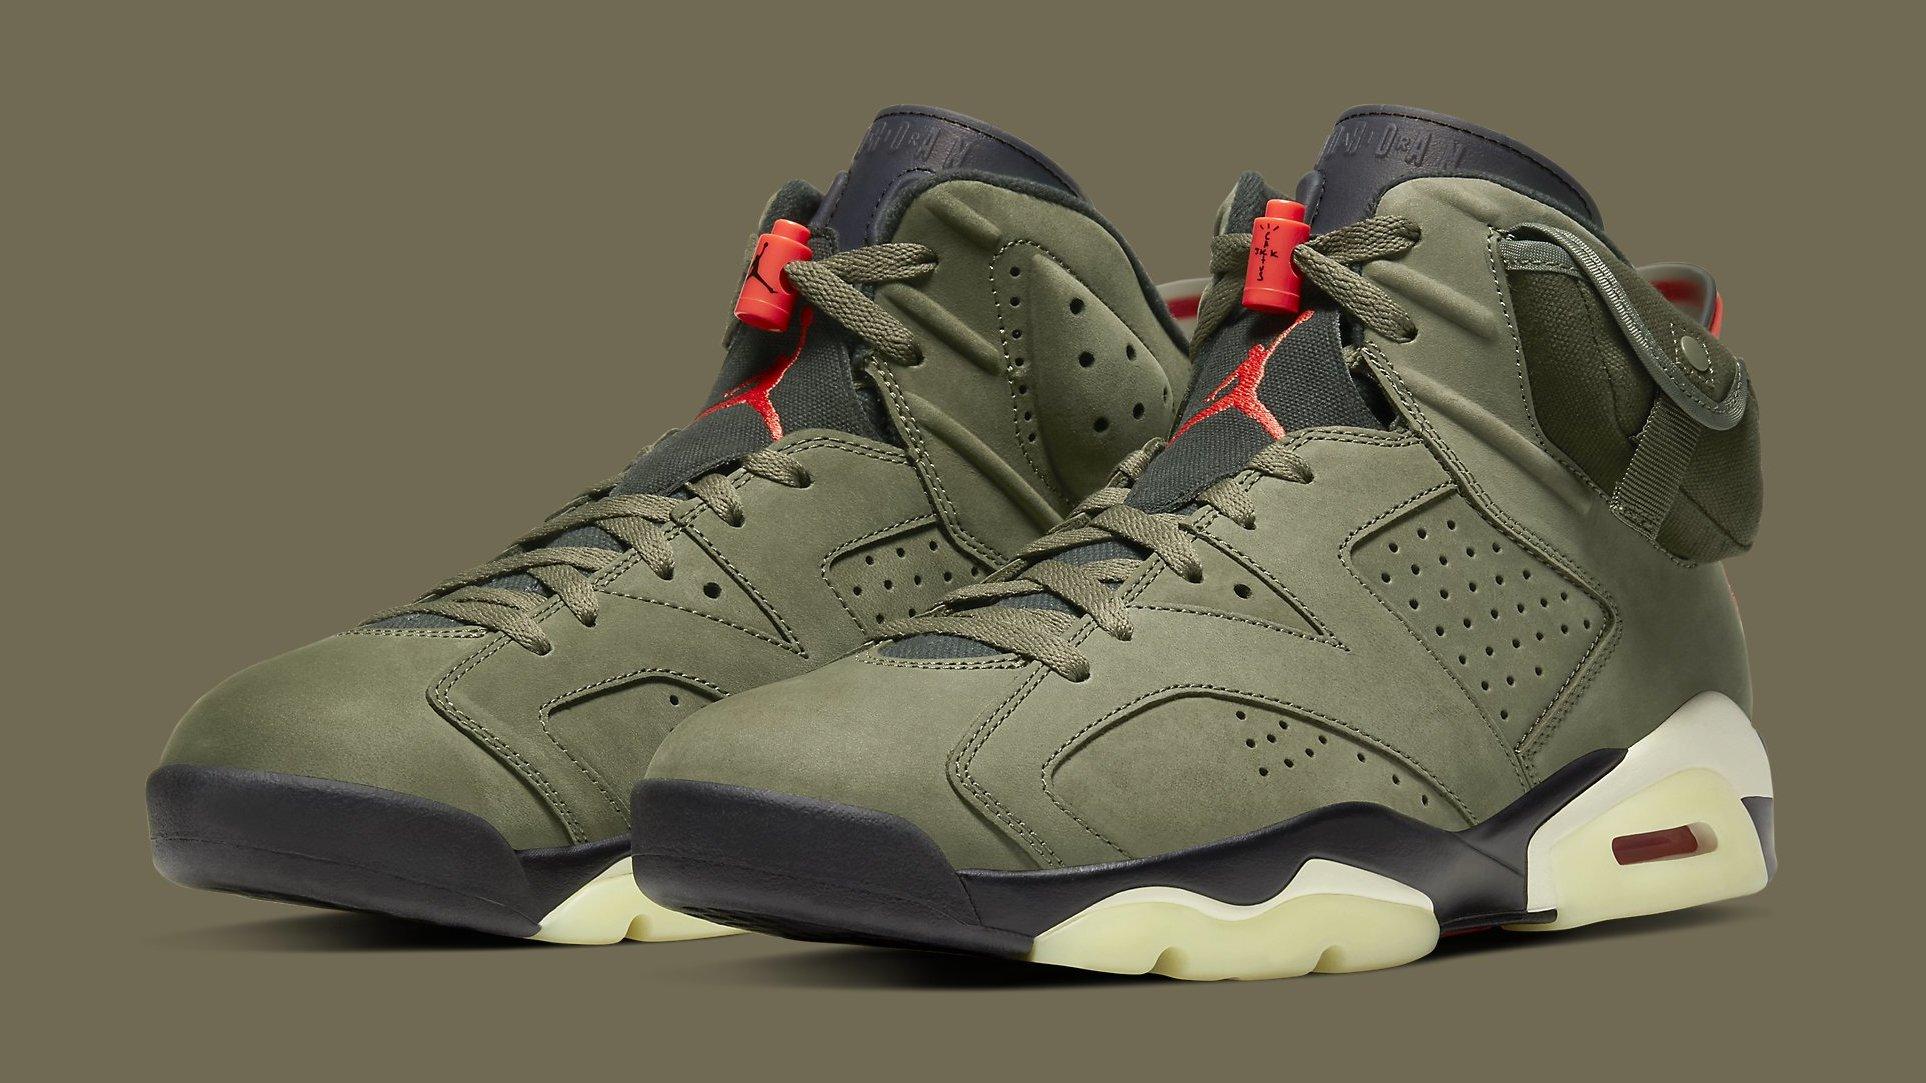 Travis Scott x Air Jordan VIs Handed Out Massive Ls to Sneakerheads